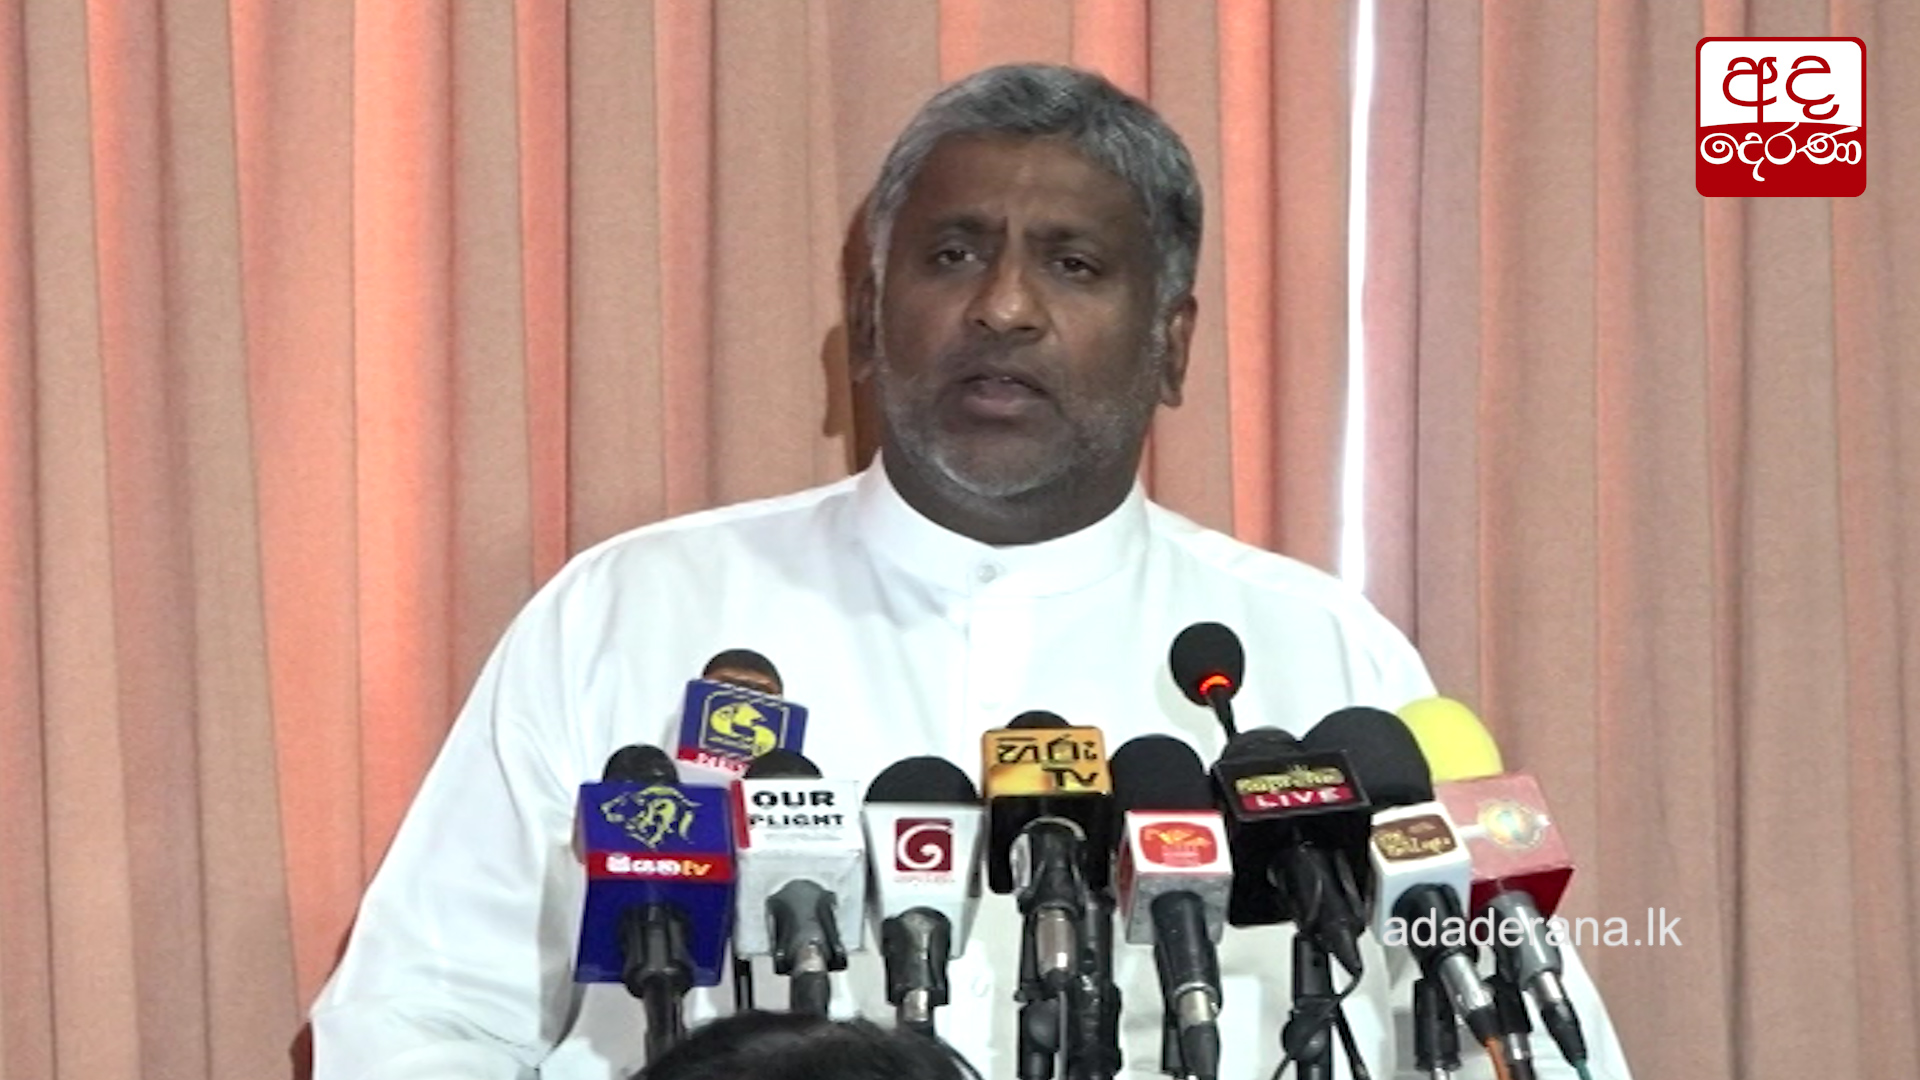 Will take every step to promote tourism industry – Prasanna Ranatunga